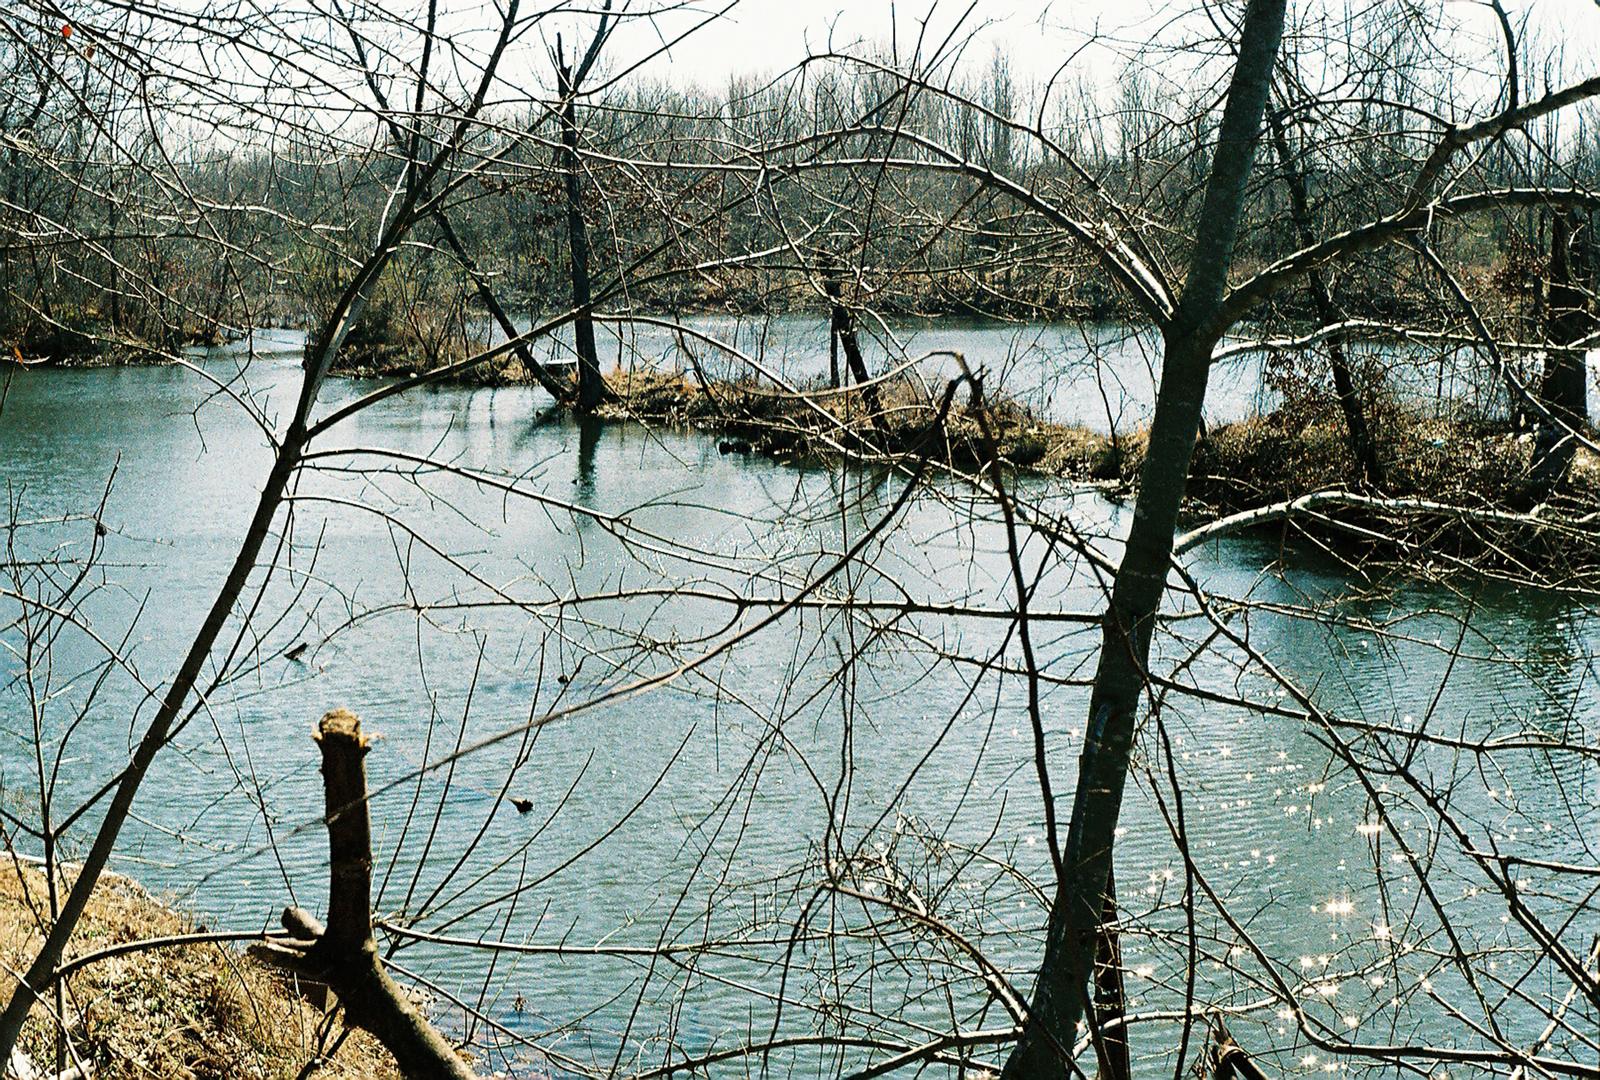 Pond, 330 Block of S. Elm Street